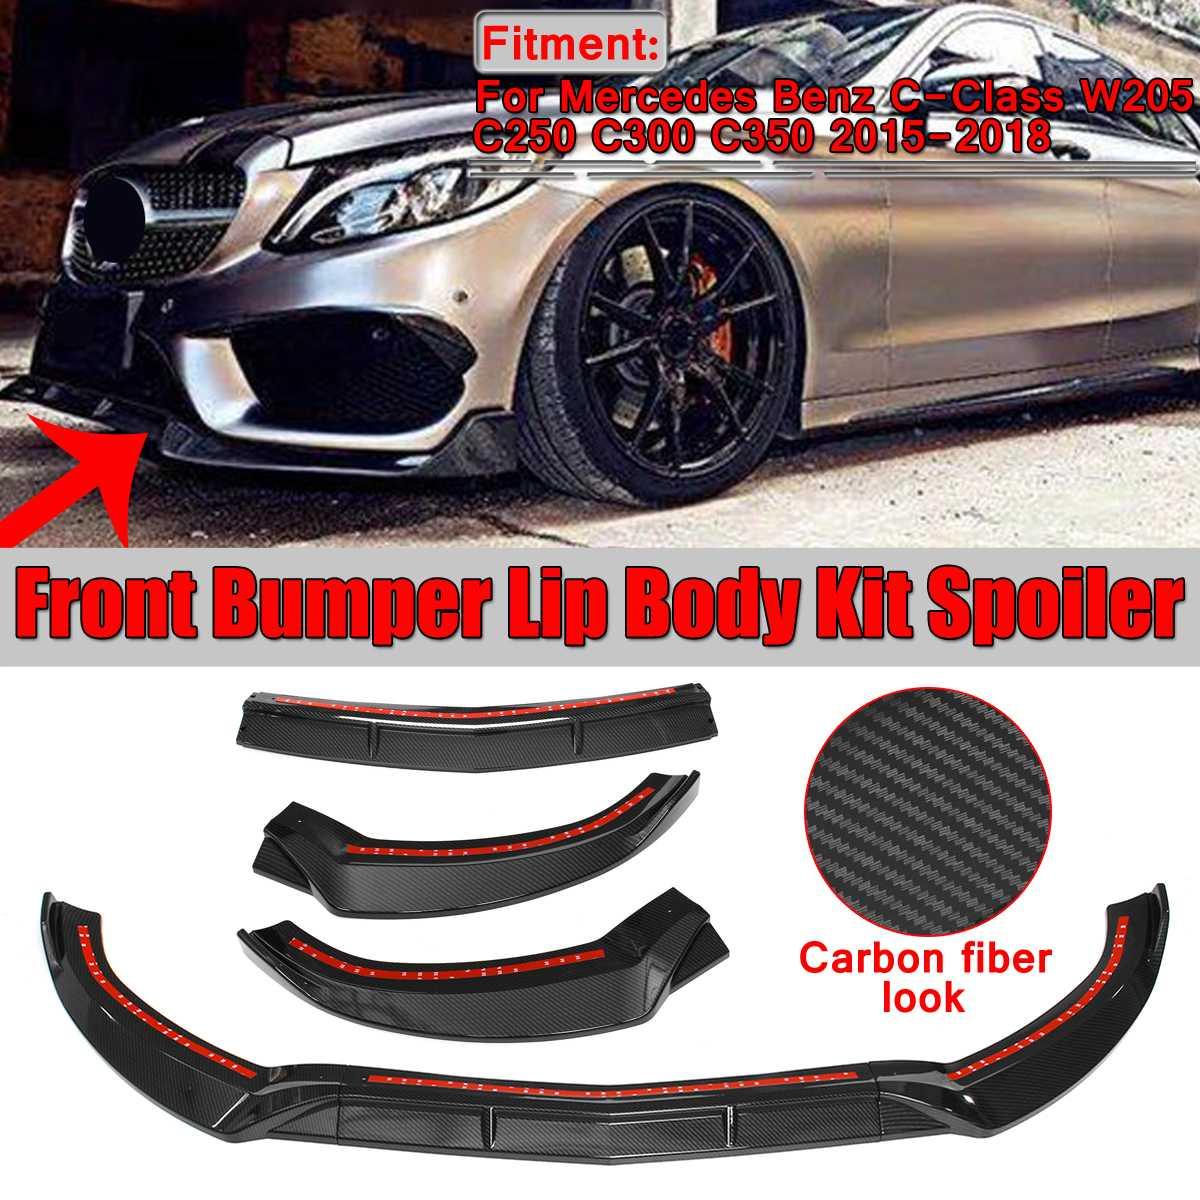 3Pcs W205 Auto Front Lippe Kinn Lip Spoiler Splitter Körper Kit Für Mercedes Für Benz C-Klasse w205 C250 C300 C350 2015-2018